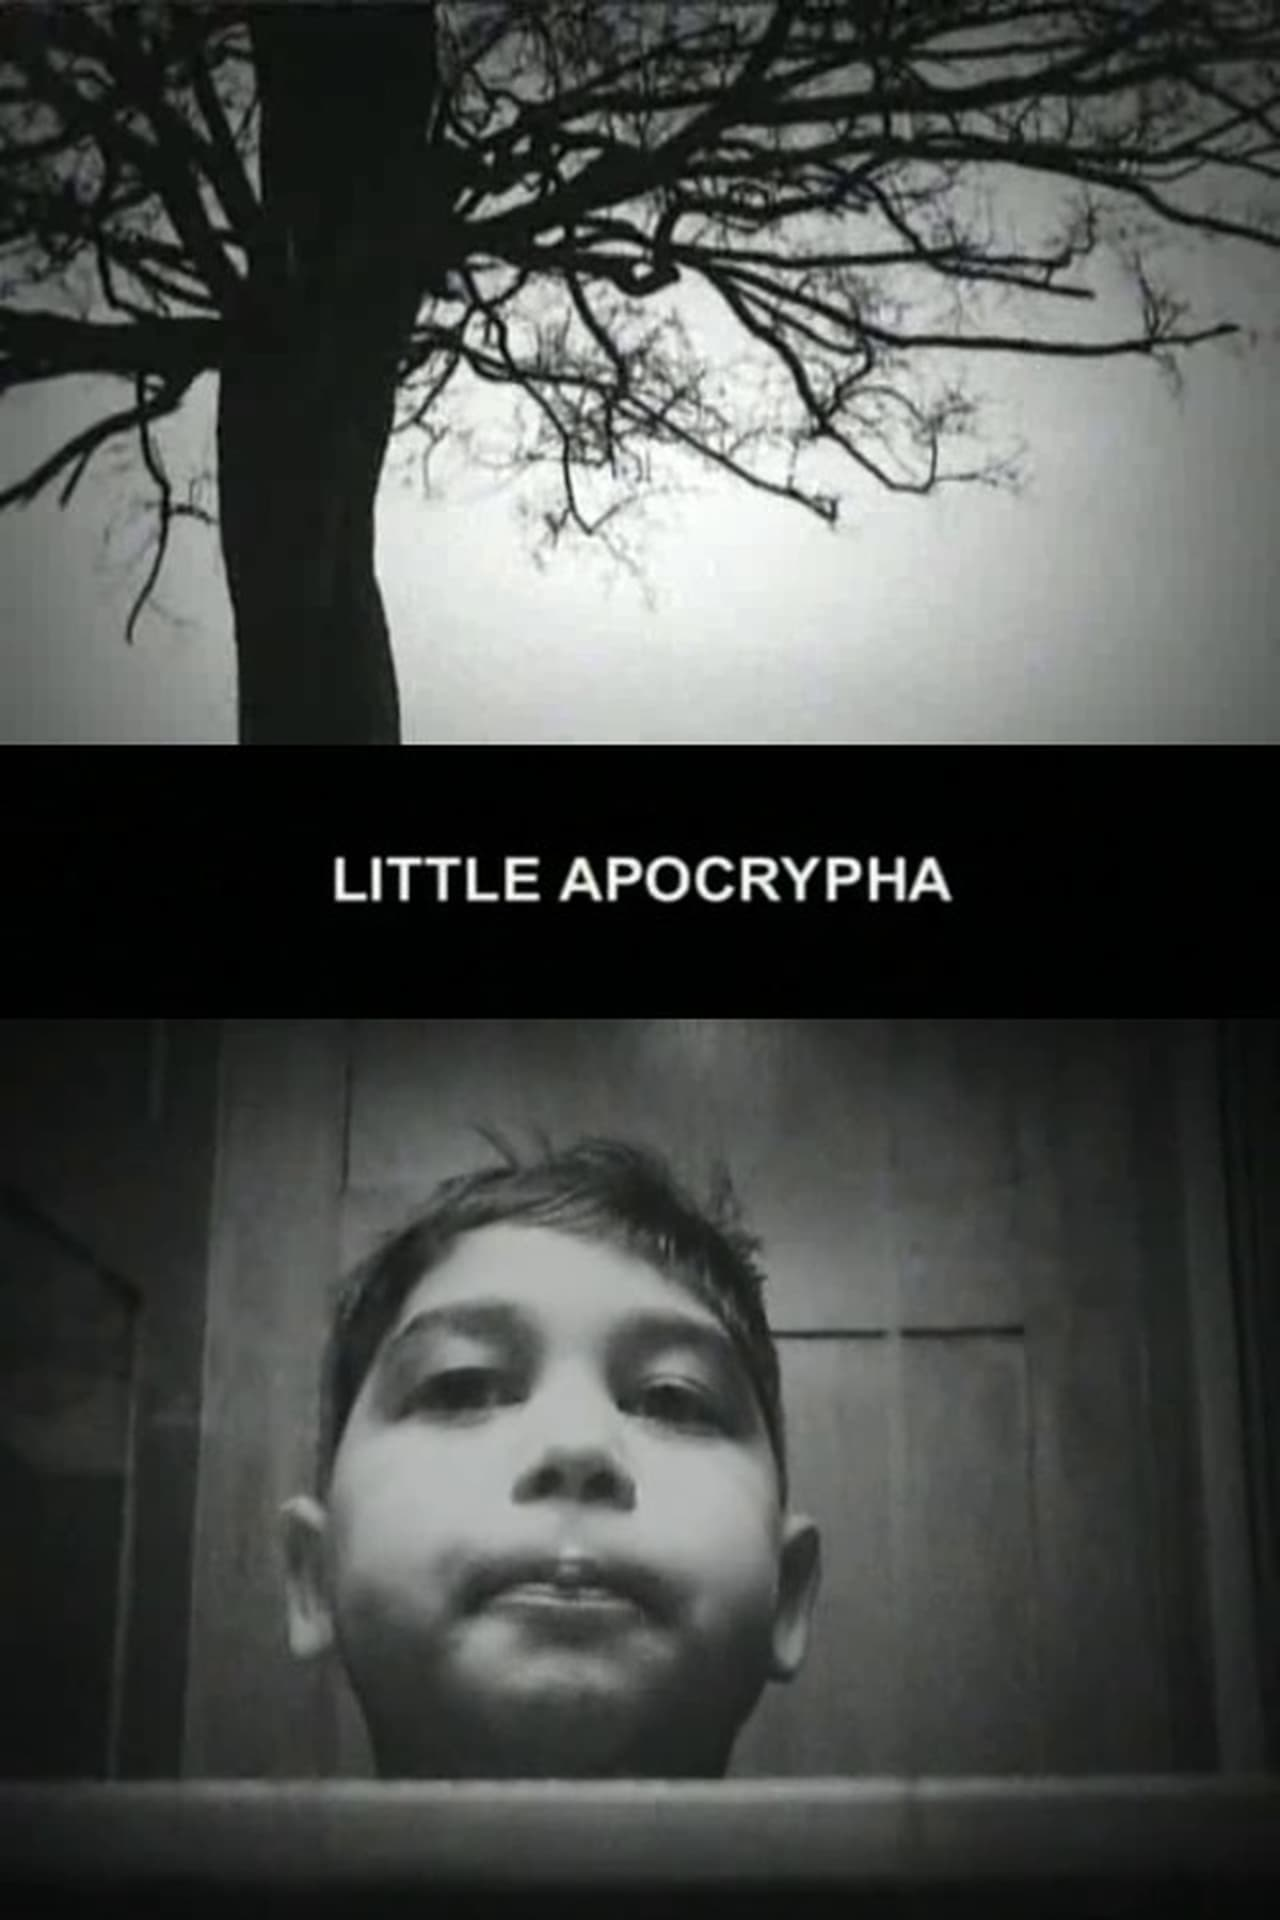 Little Apocrypha No. 1